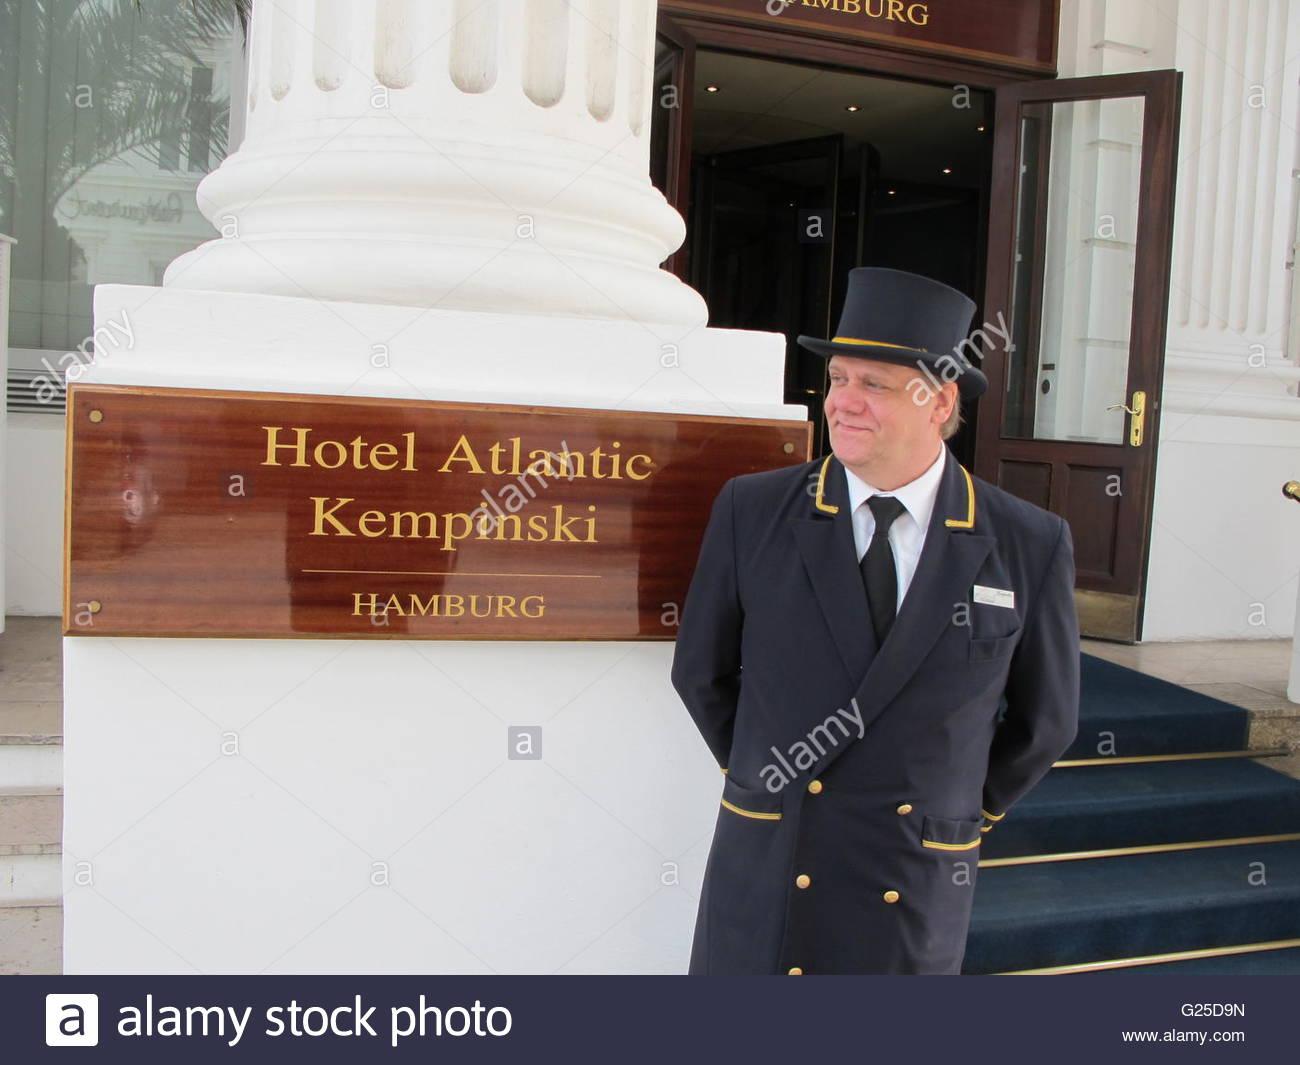 Germany - Hamburg, Hotel Atlantic - Stock Image